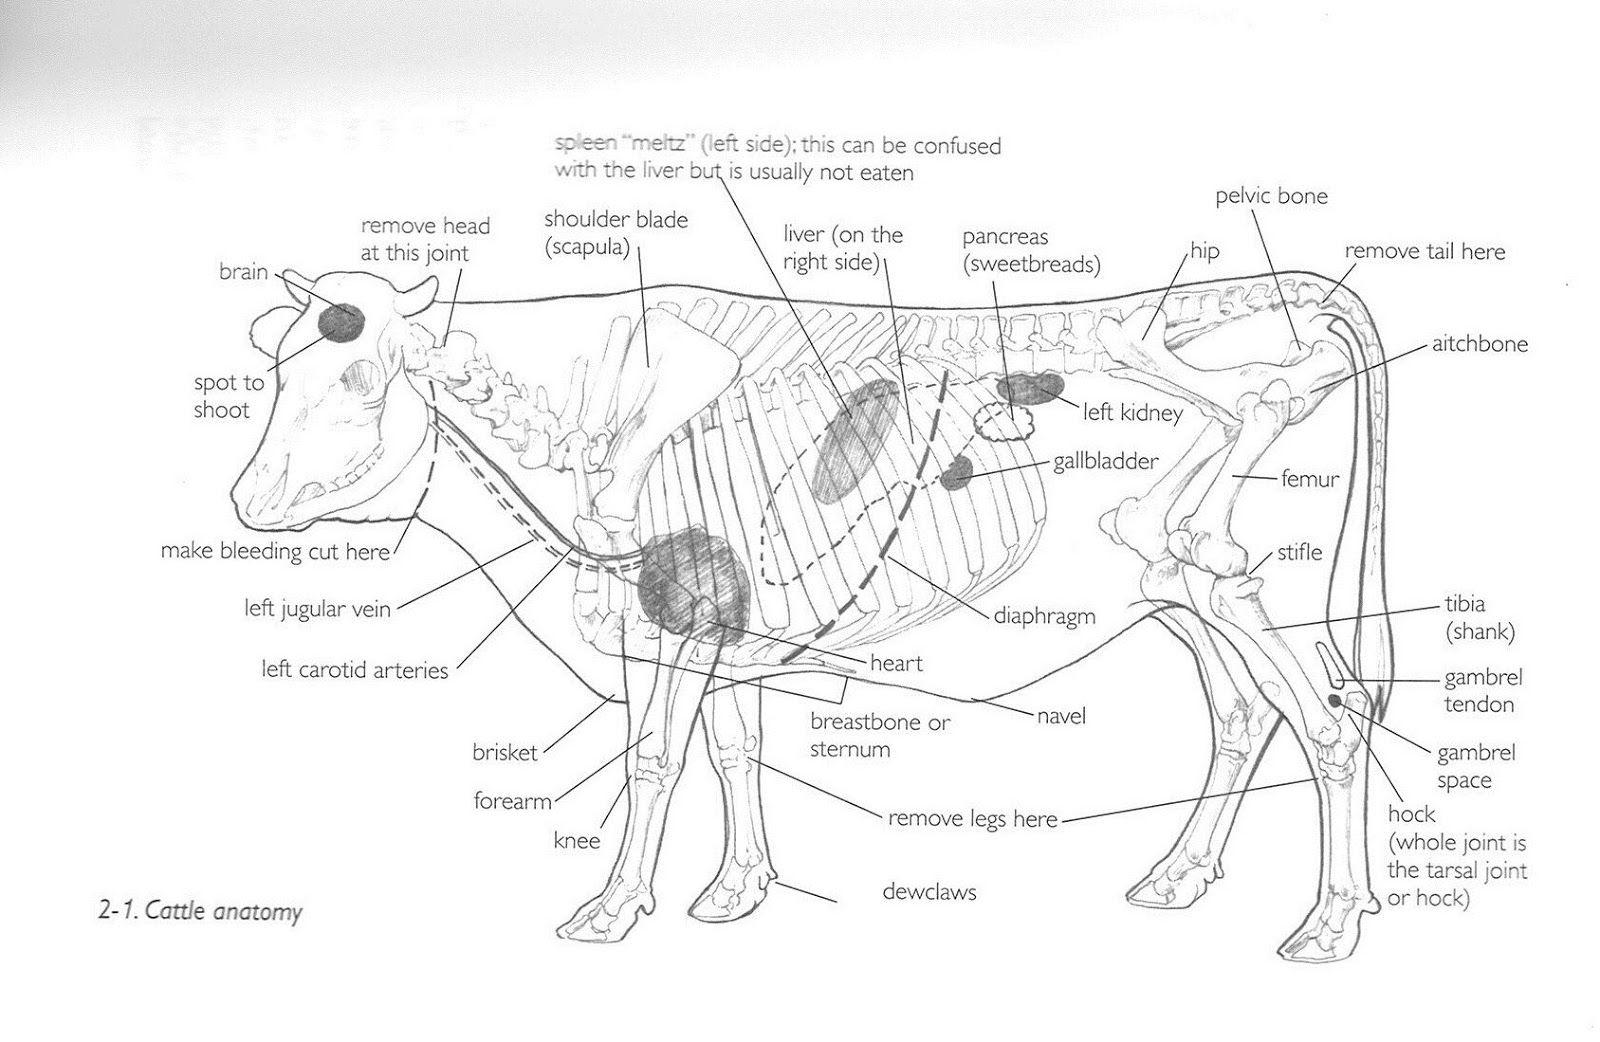 cow stomach, cow skeleton, stomach diagram, scapula, bones, mammals,  sketches